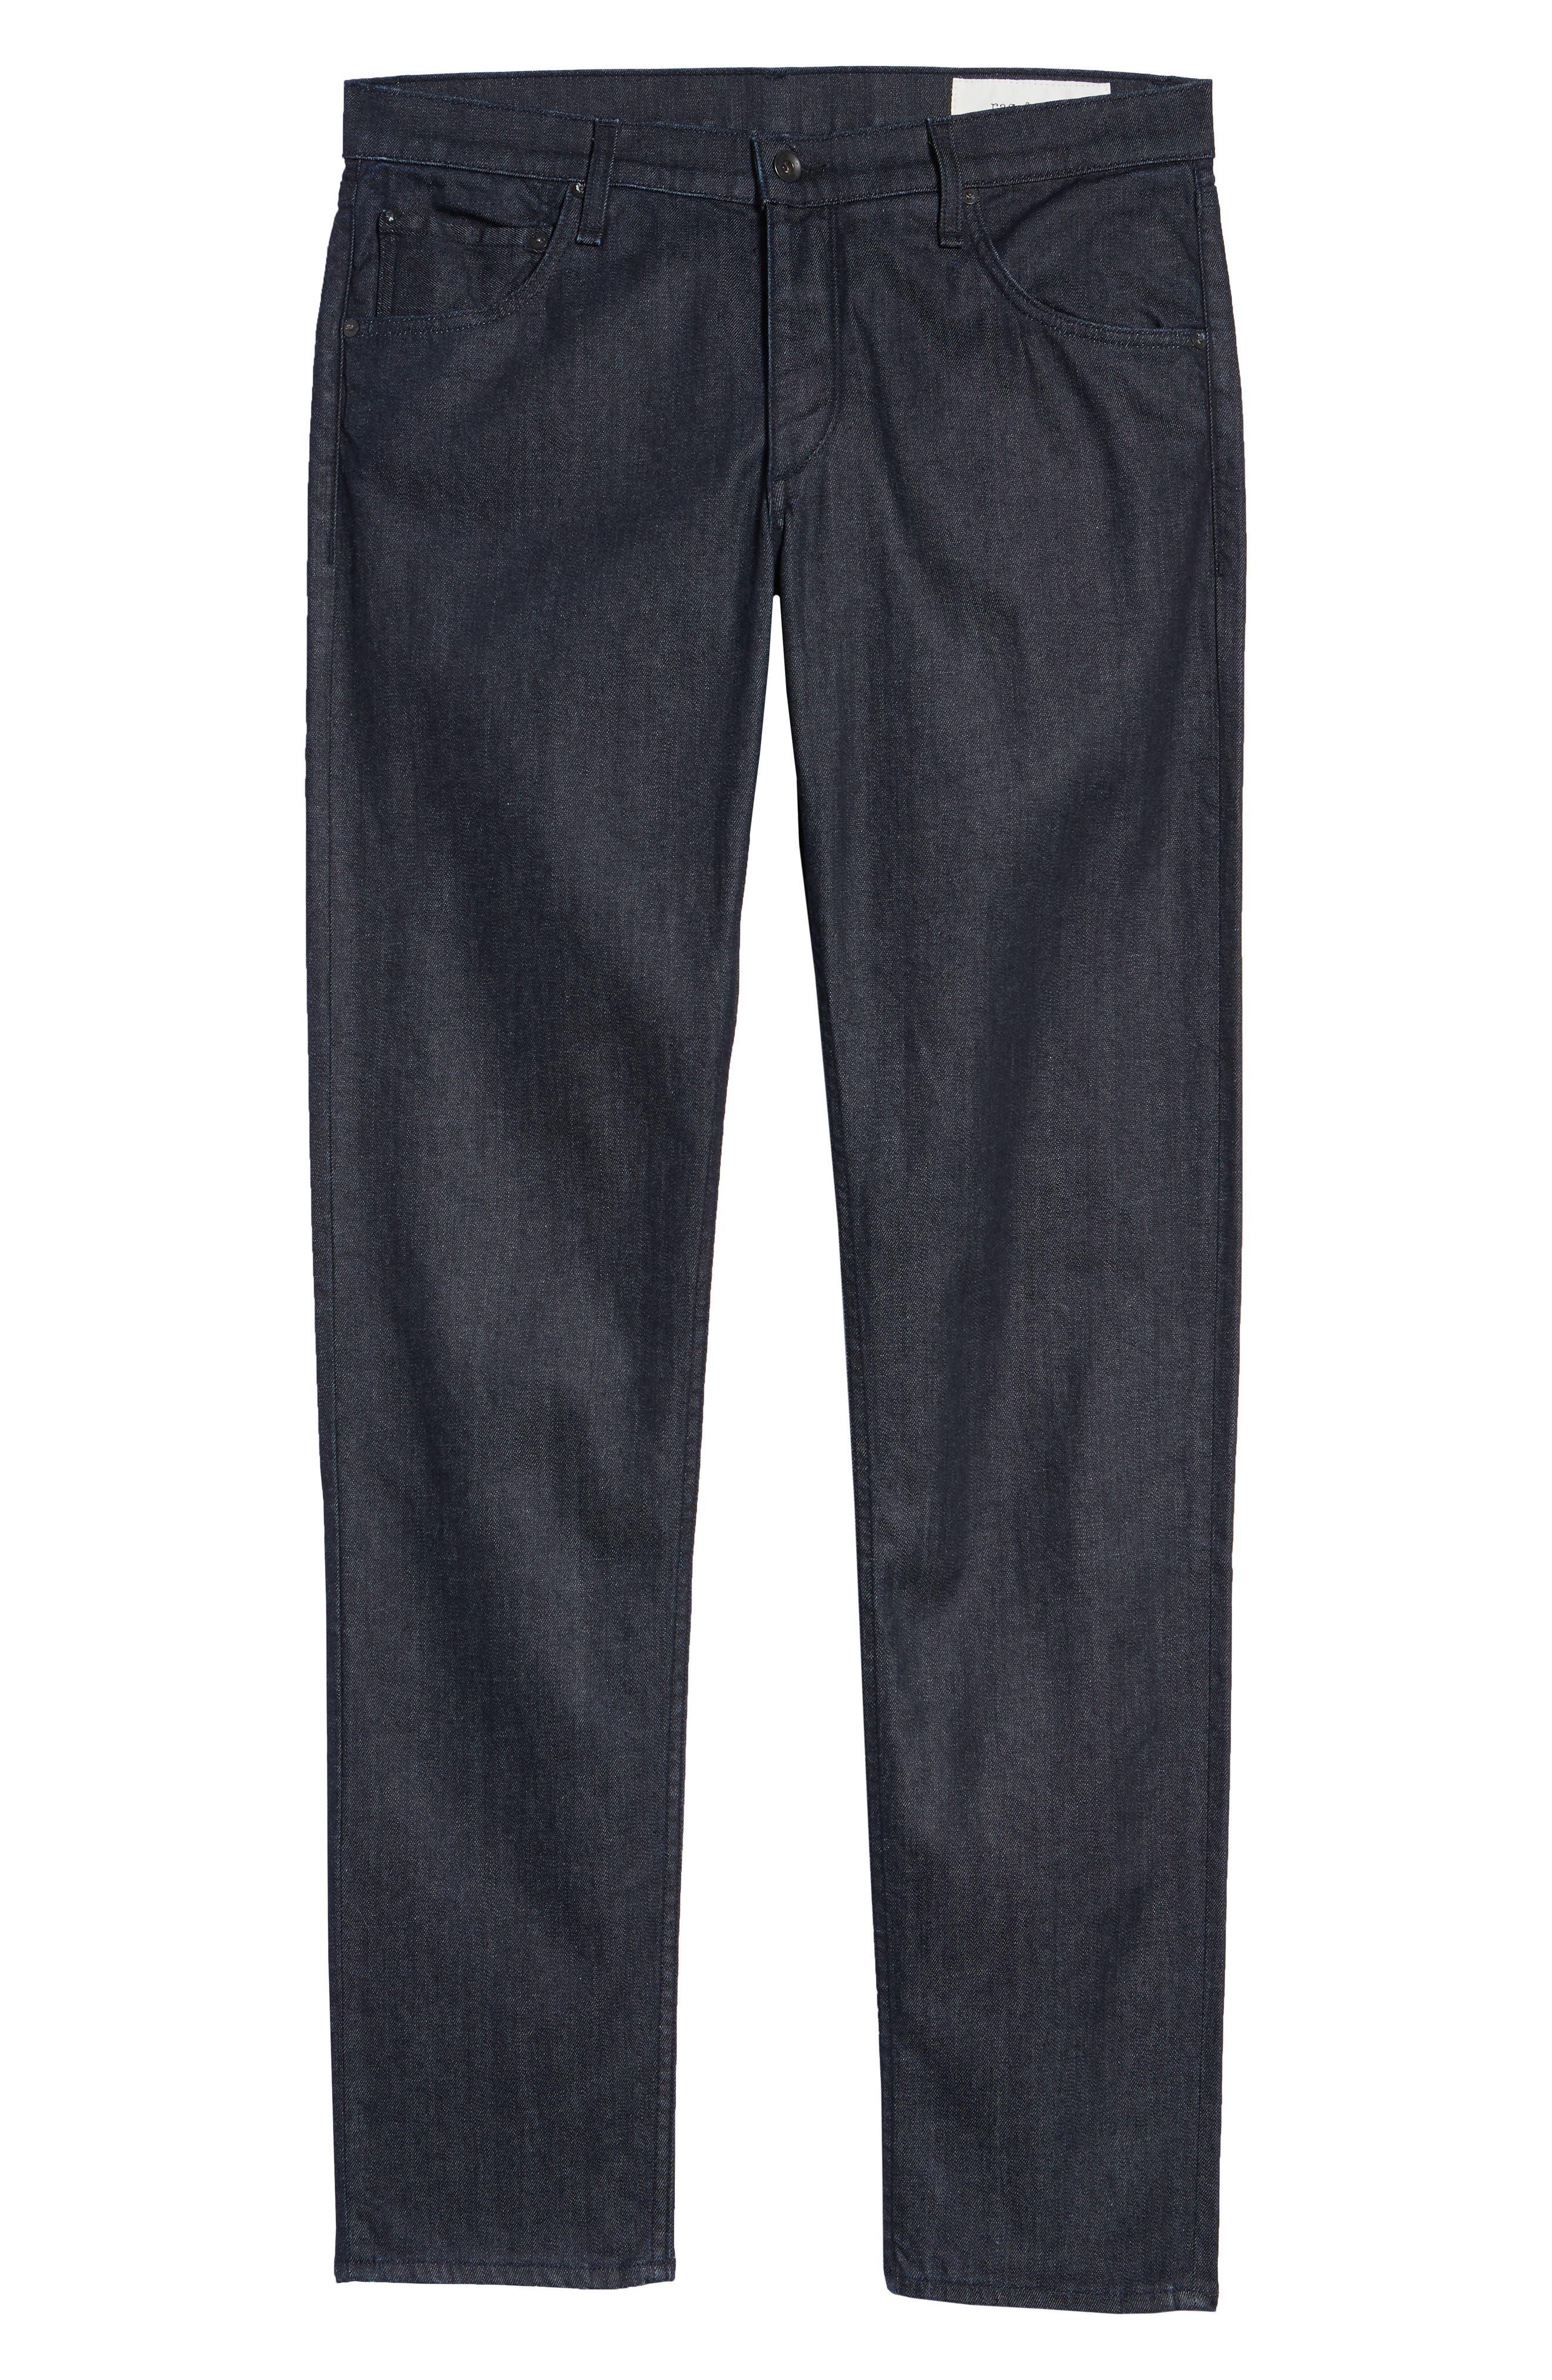 RAG & BONE, Standard Issue Fit 2 Slim Fit Jeans, Alternate thumbnail 2, color, TONAL RINSE